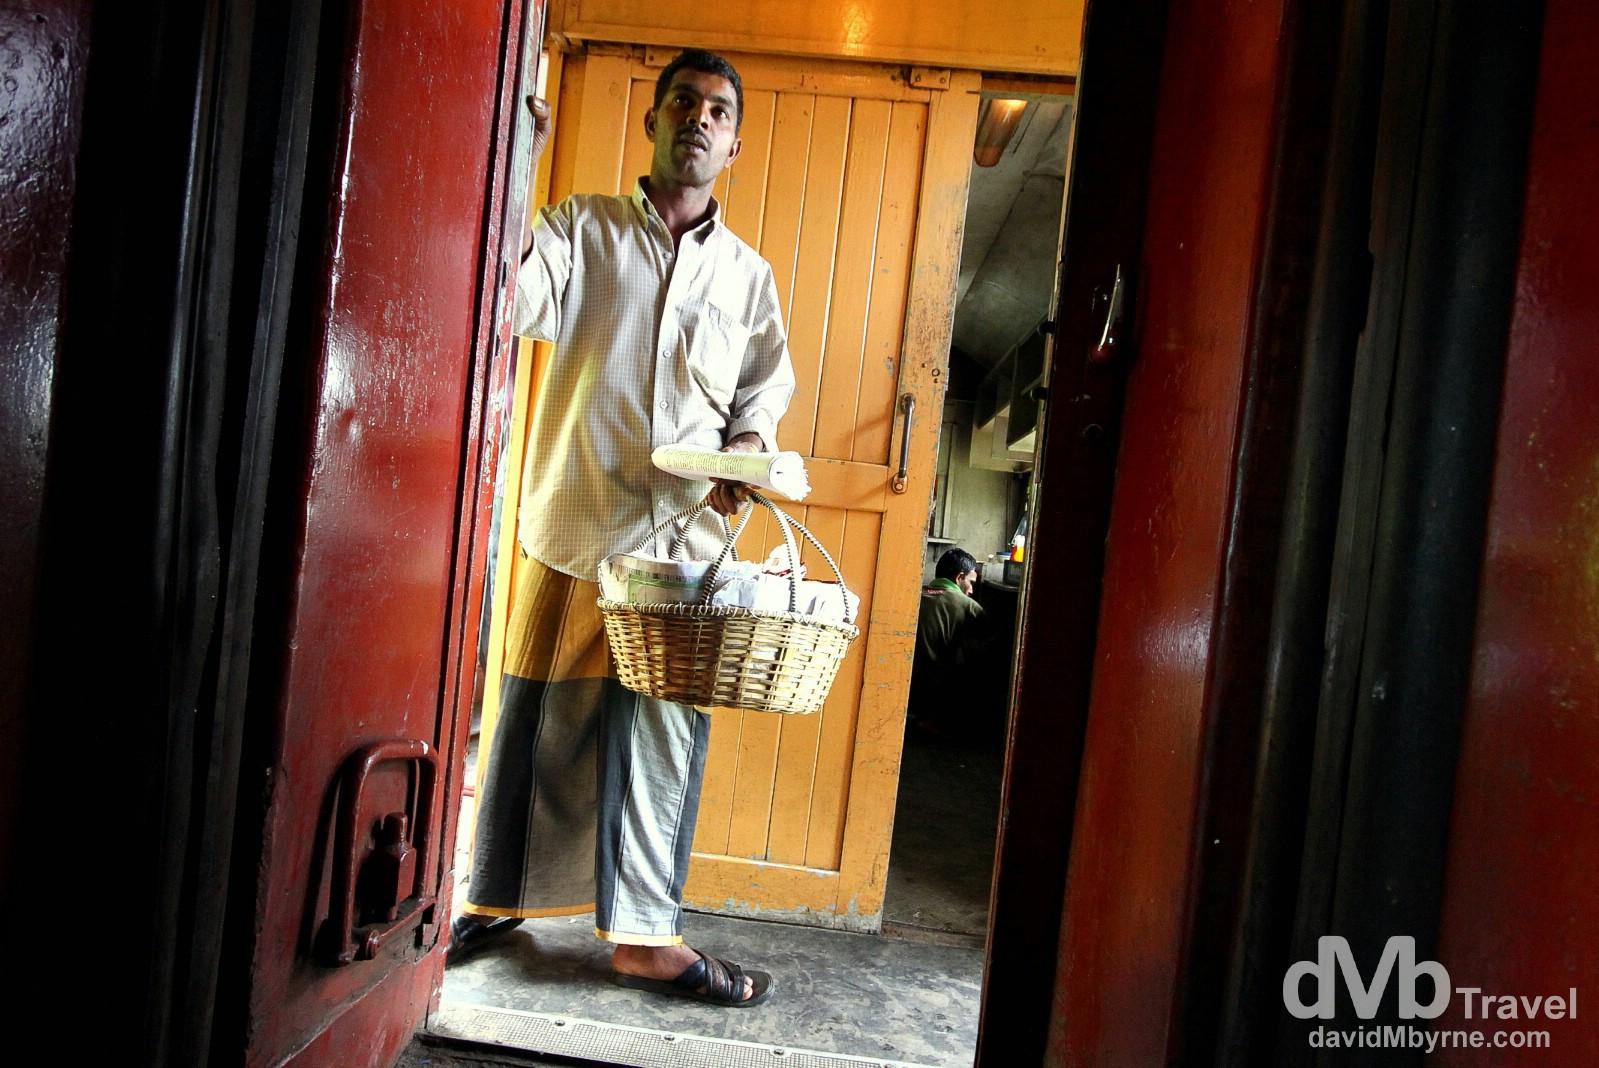 A vendor on the Kandy-bound train, central Sri Lanka. September 7th 2012.